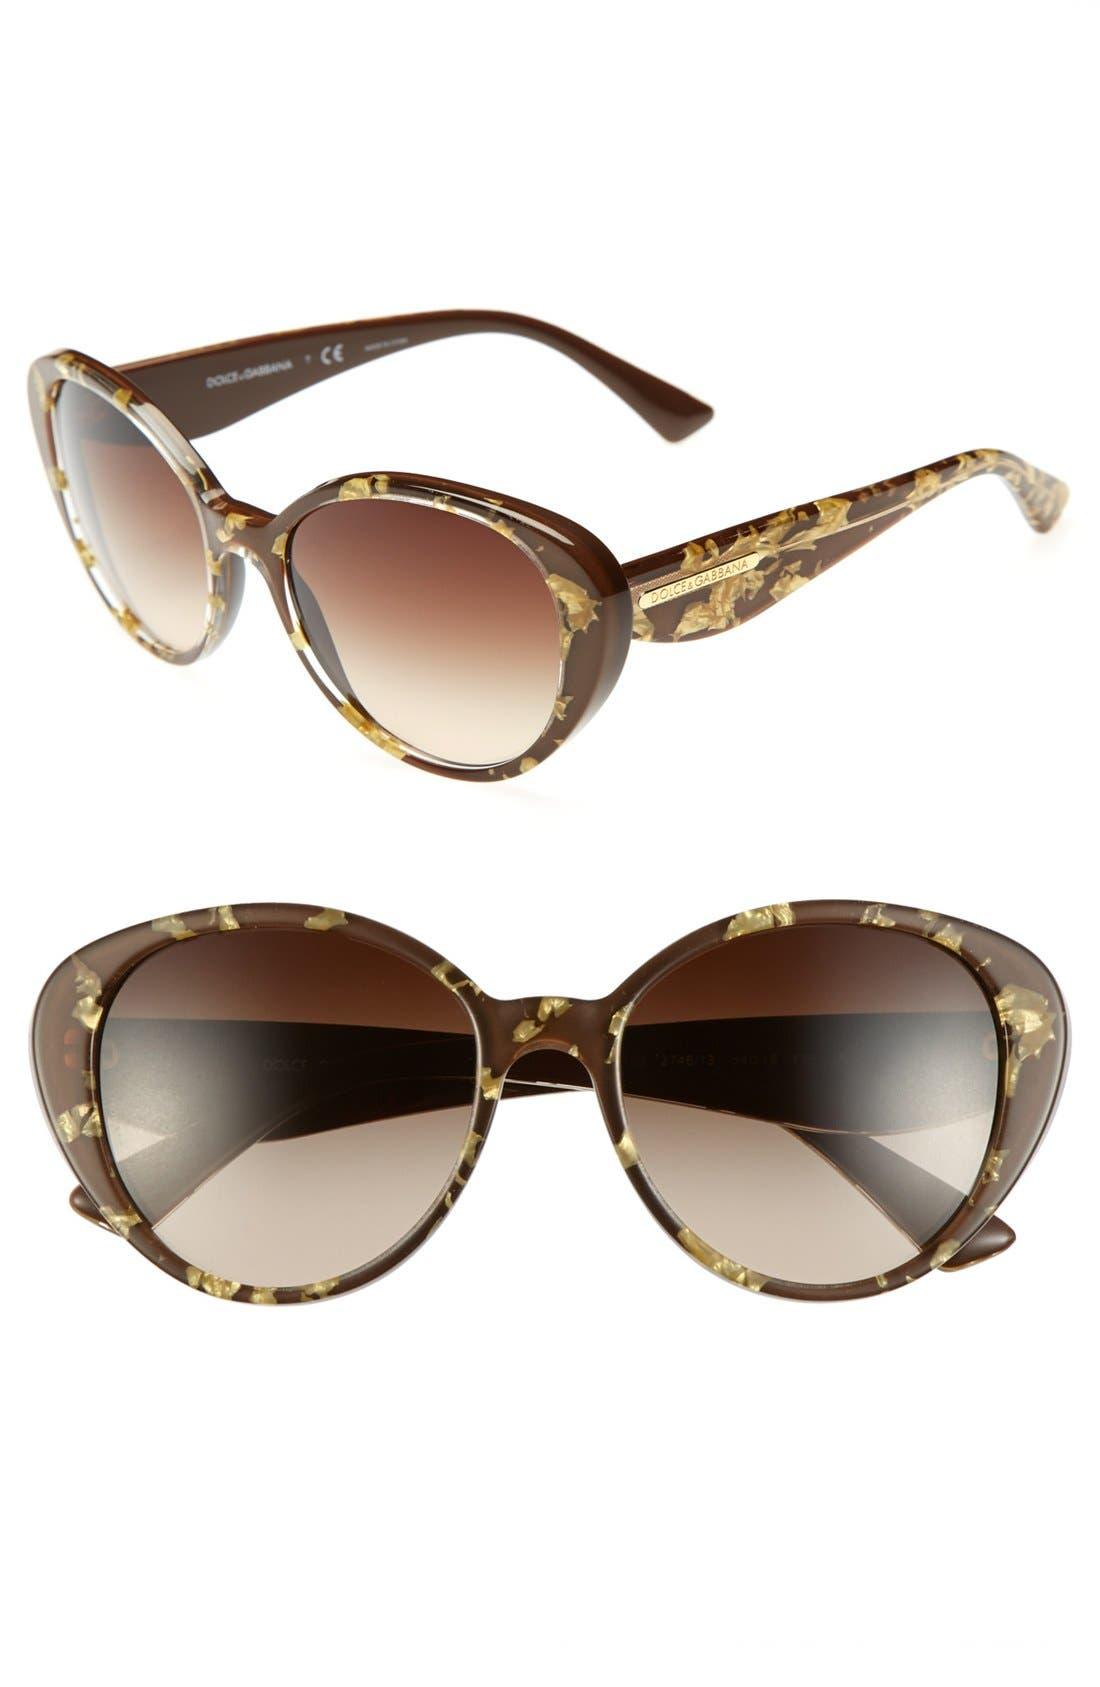 Main Image - Dolce&Gabbana 'Gold Leaf' 54mm Sunglasses